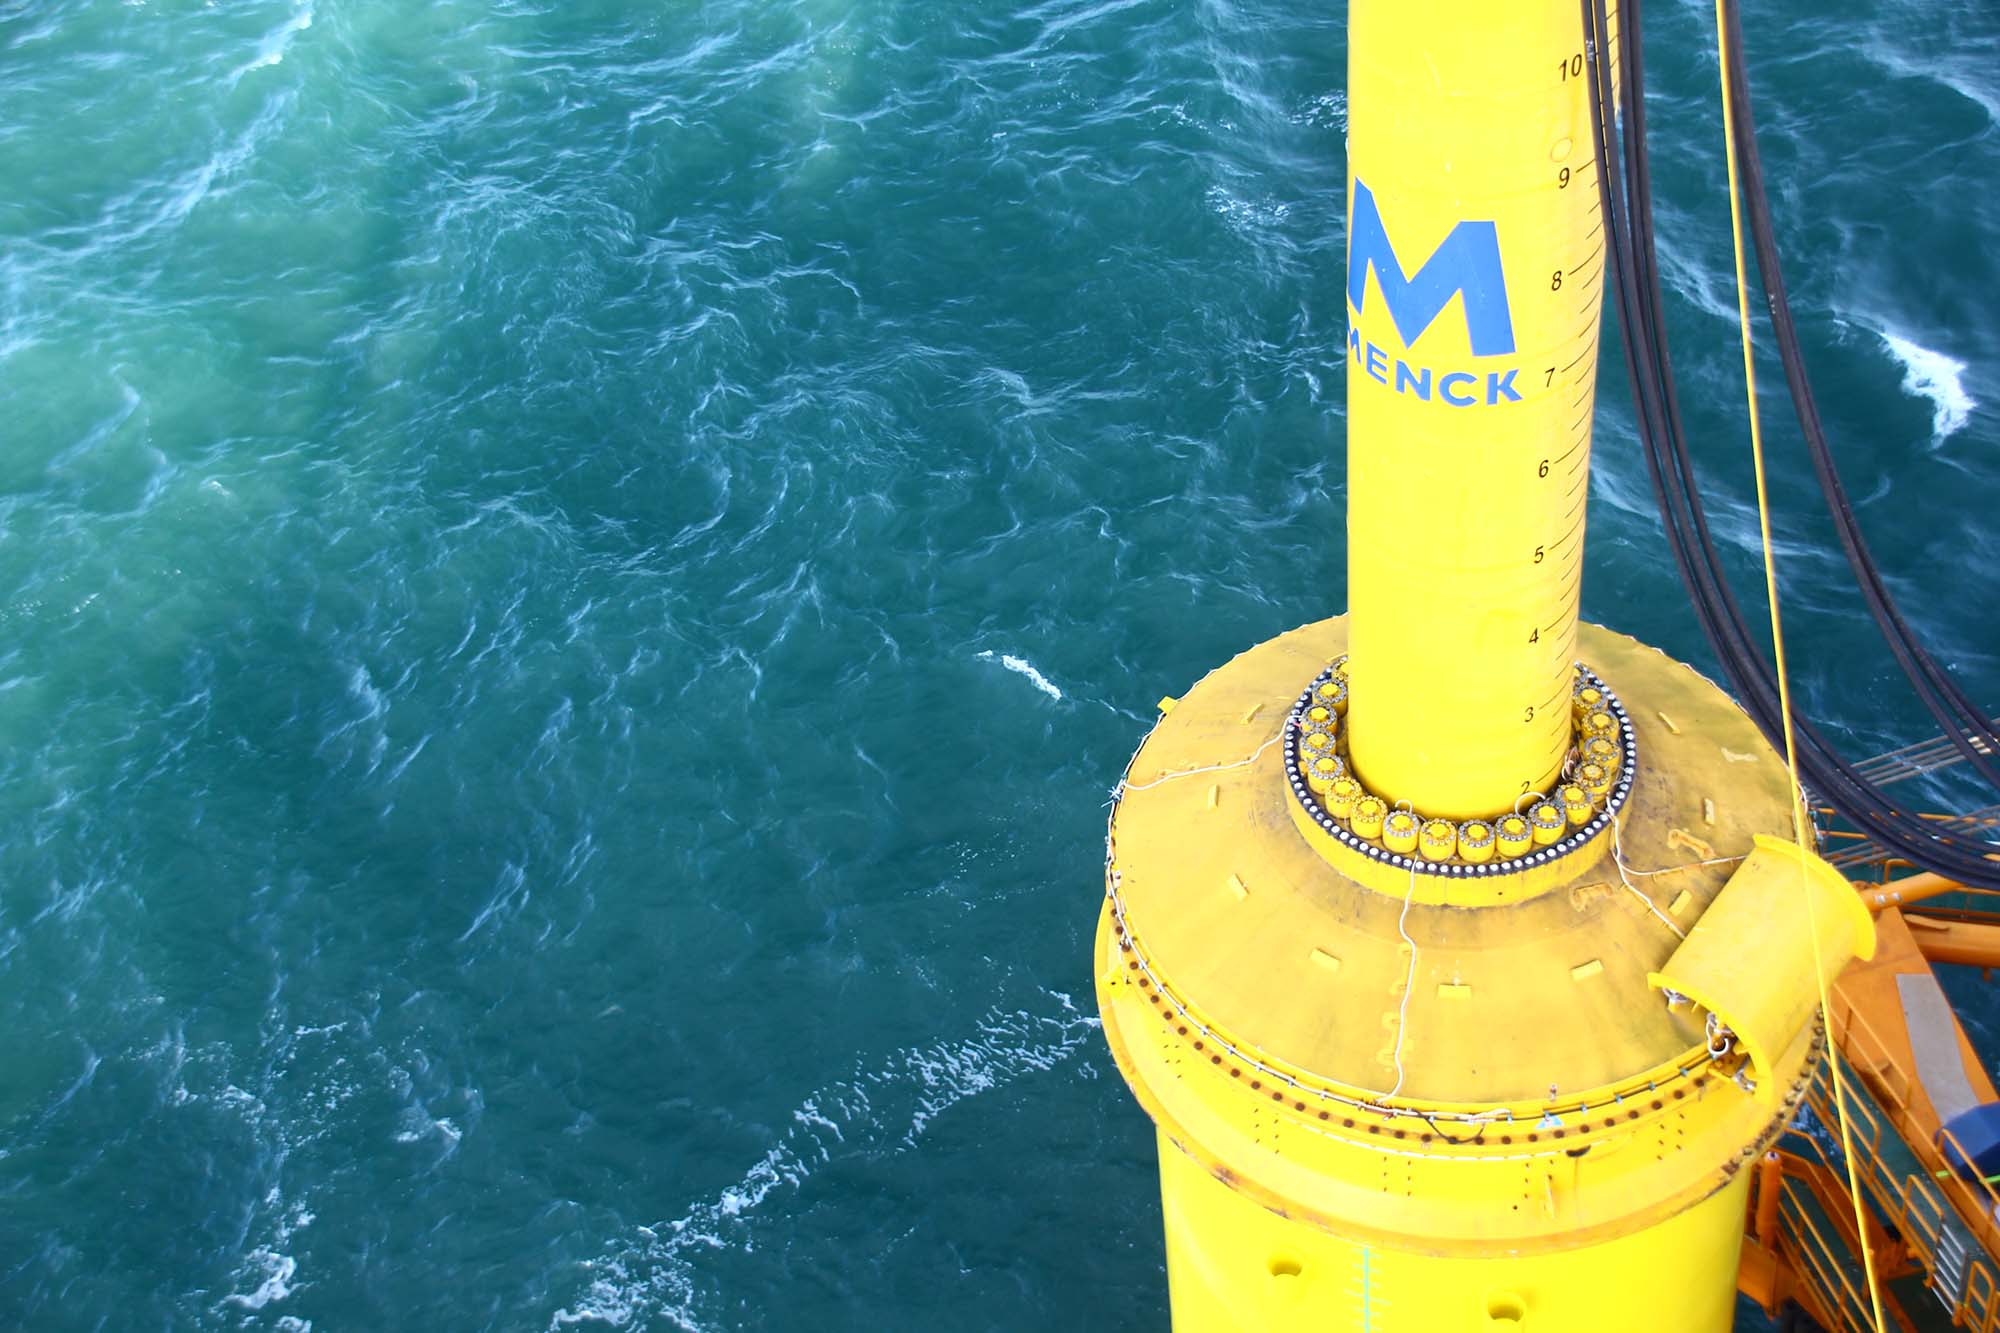 Van Oord orders hammer spread from MENCK for Italian offshore wind farm